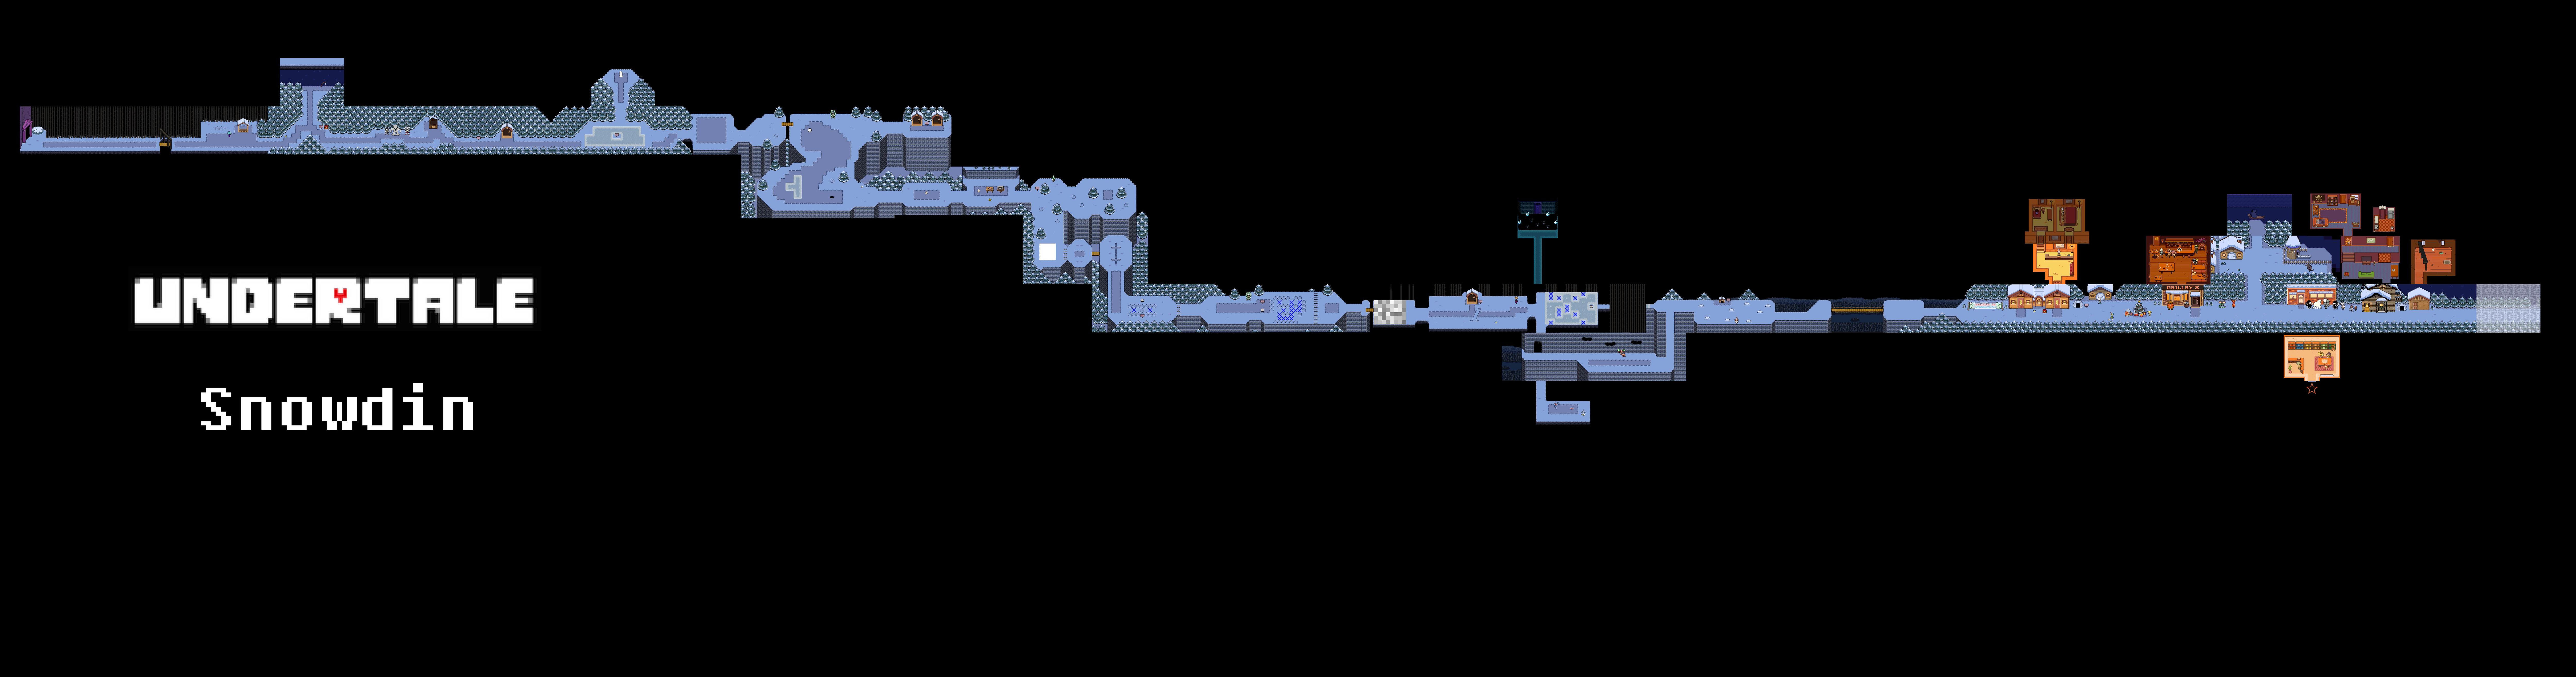 Undertale Complete Map - Snowdin by Papikari on DeviantArt